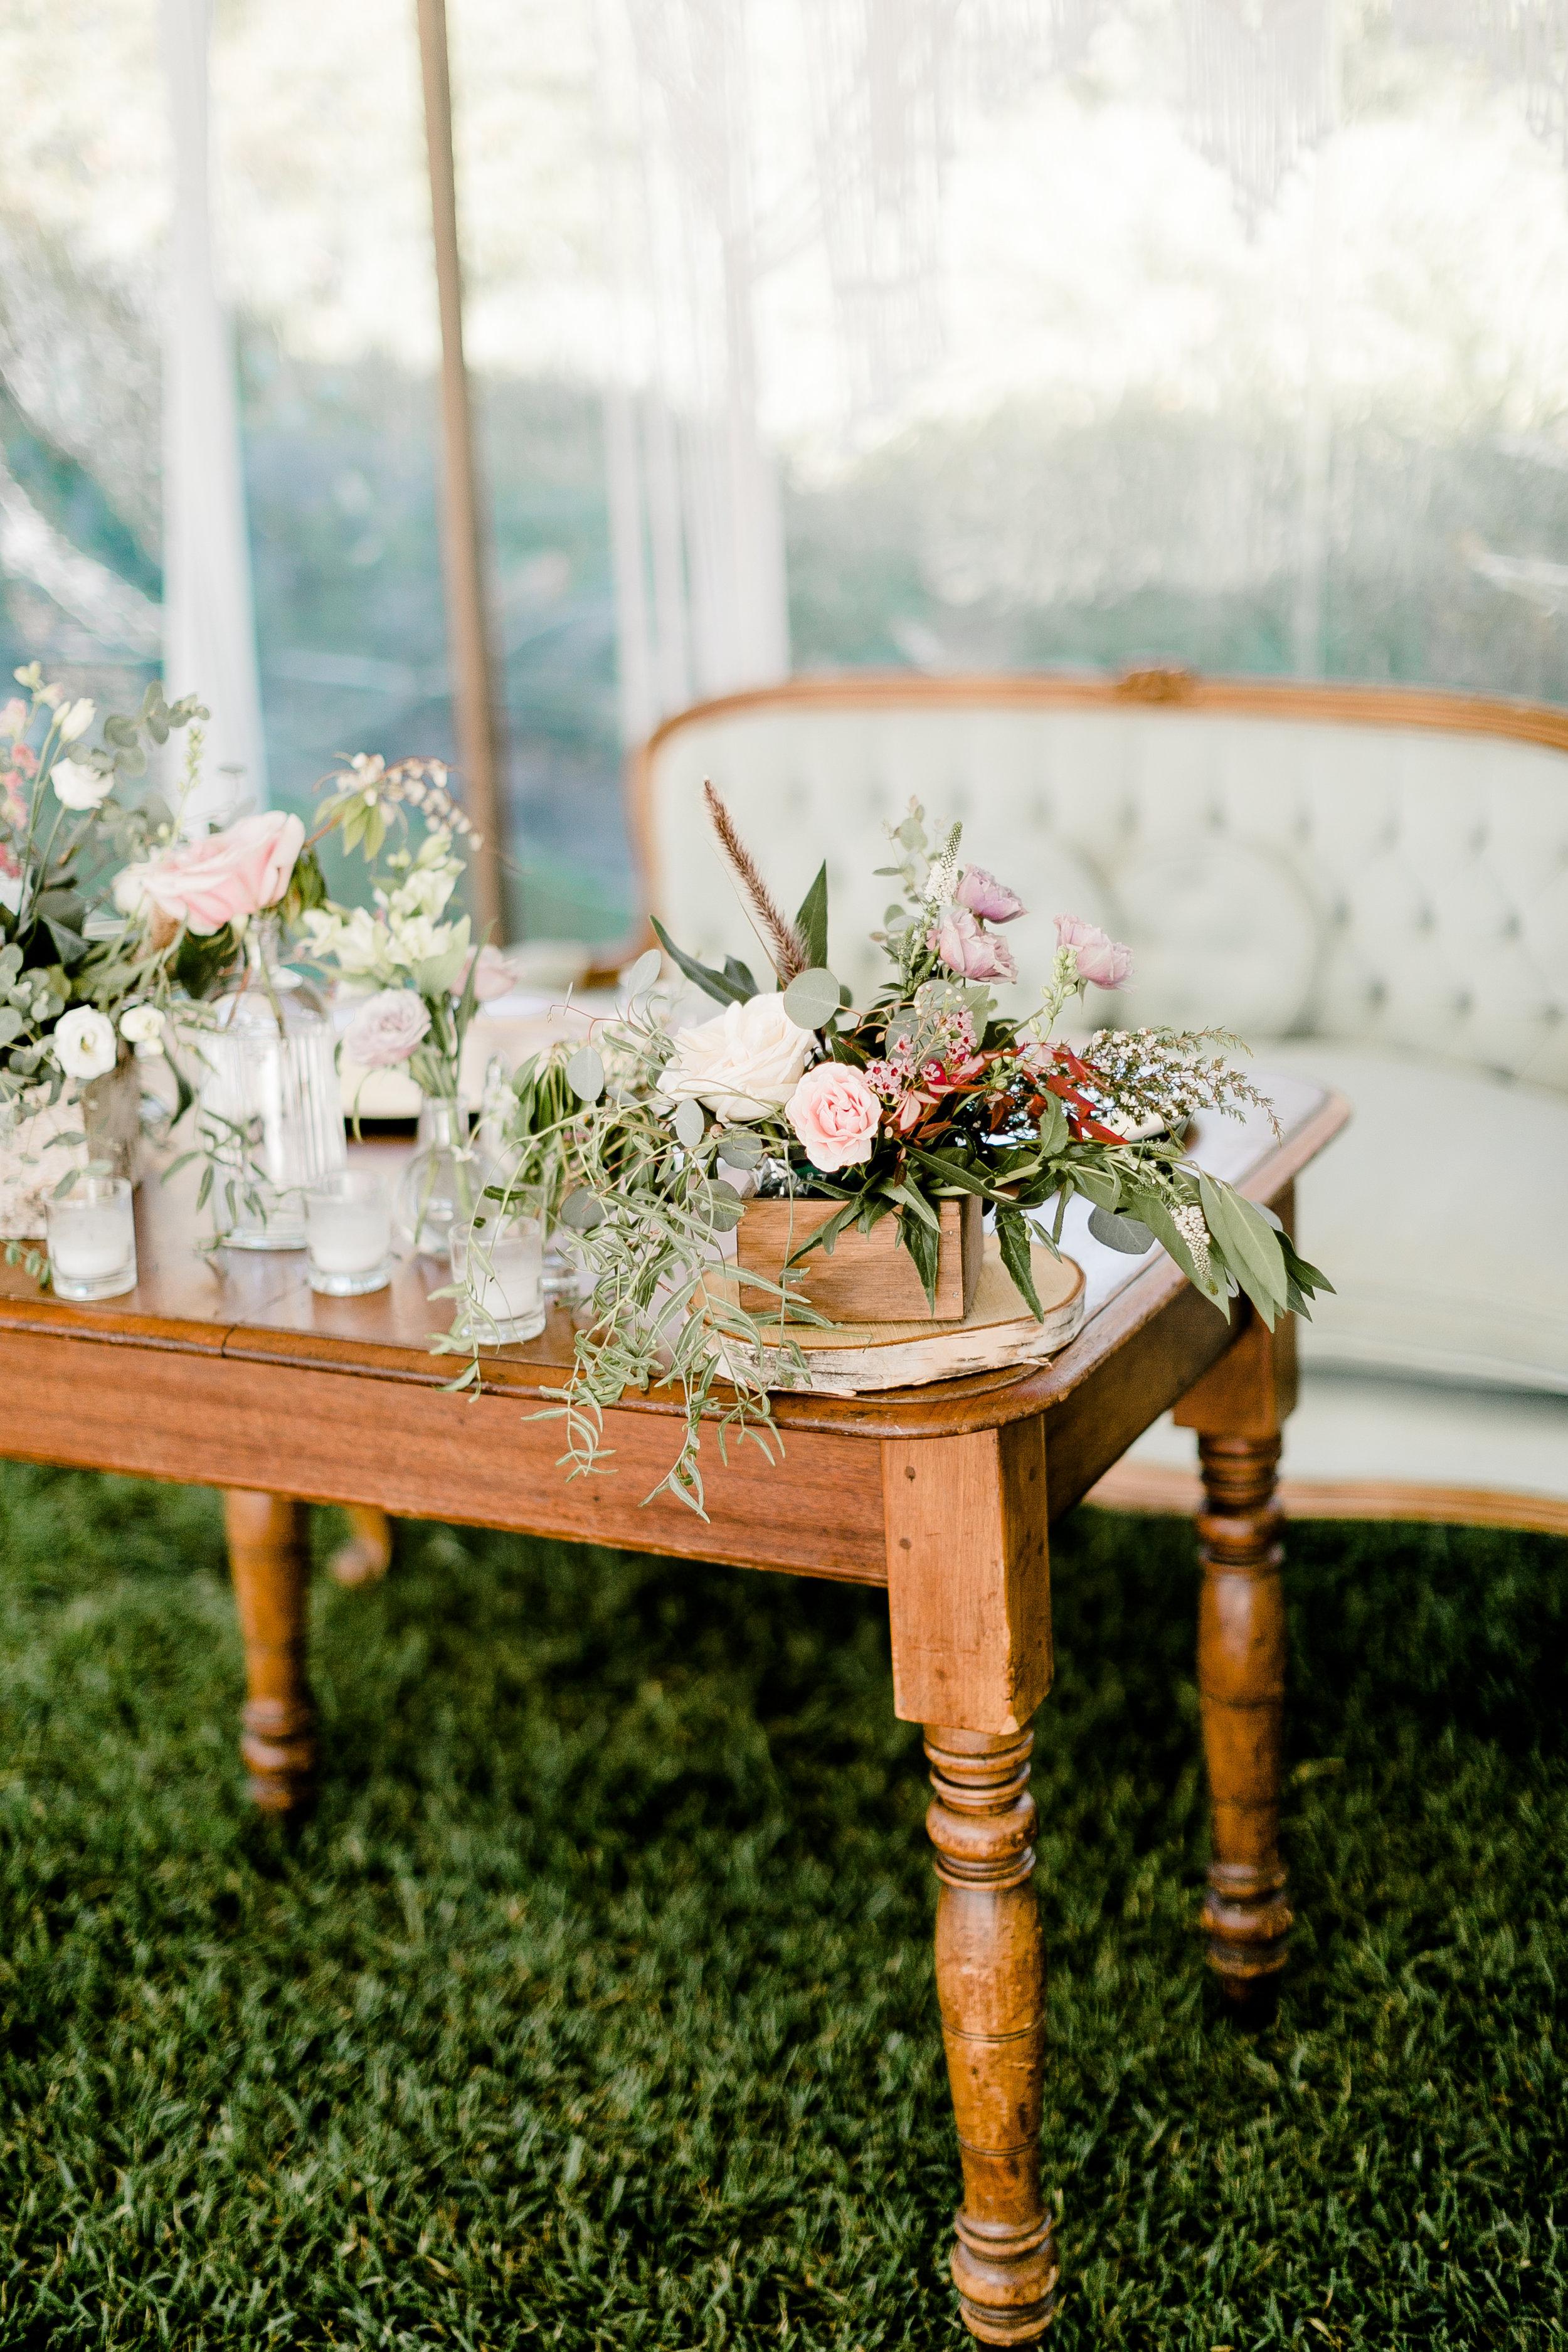 South-Coast-Botanic-Garden-Wedding-Planner21.jpg